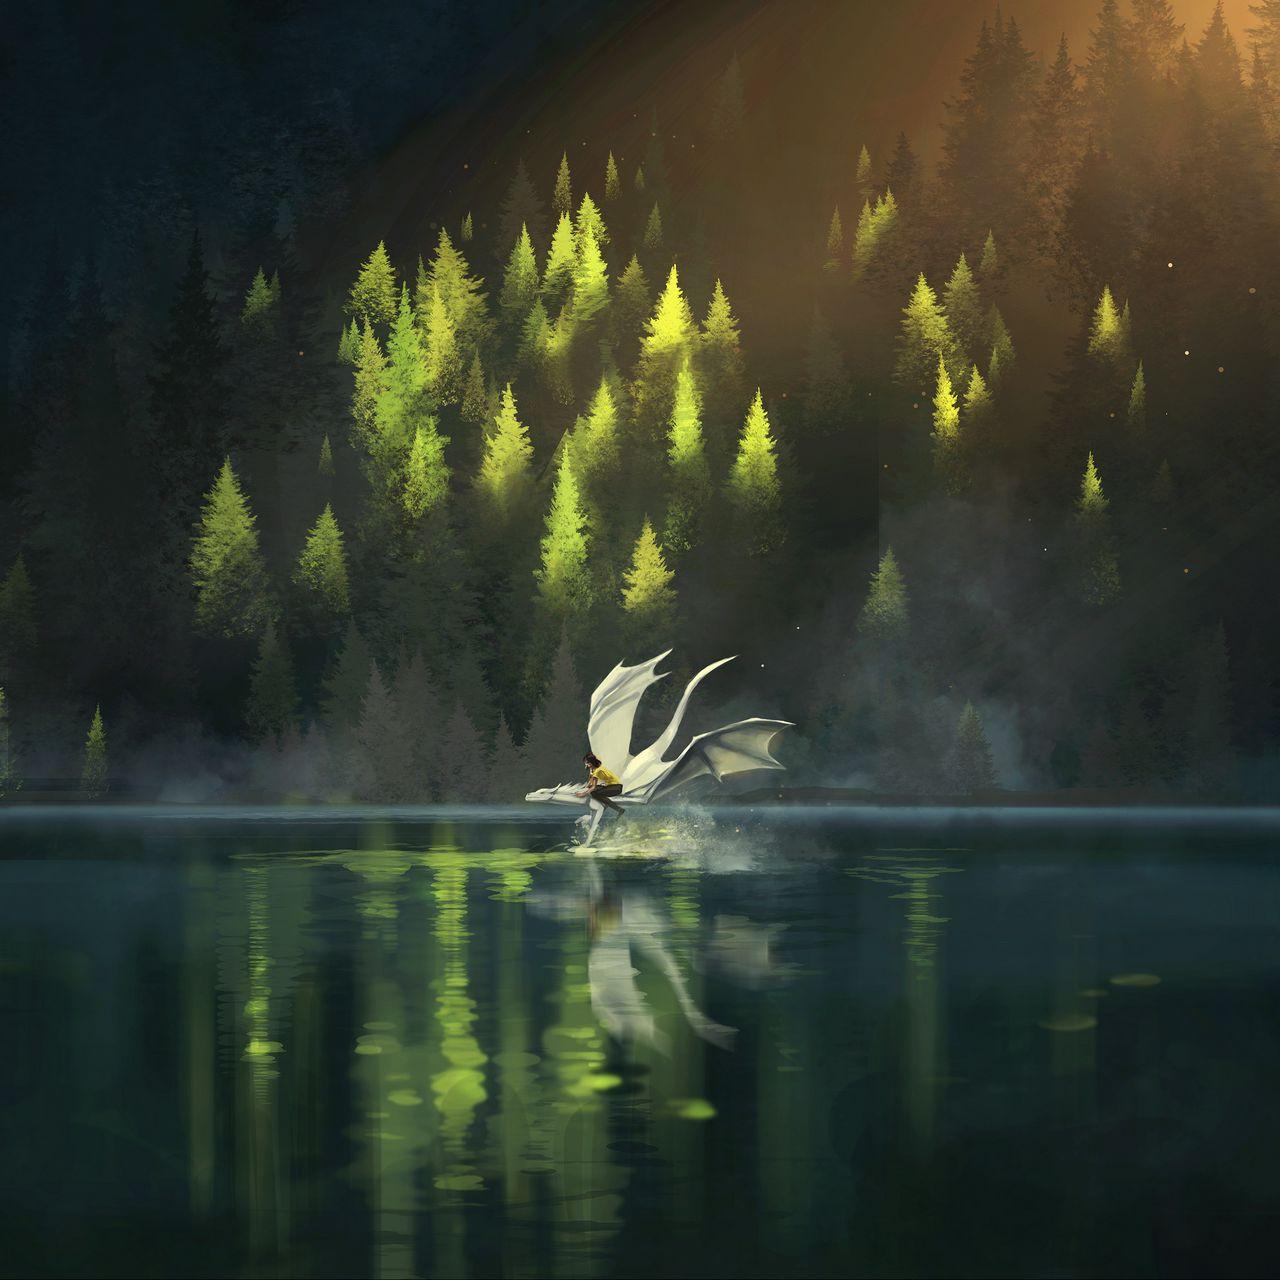 1280x1280 Wallpaper dragon, friends, fantasy, art